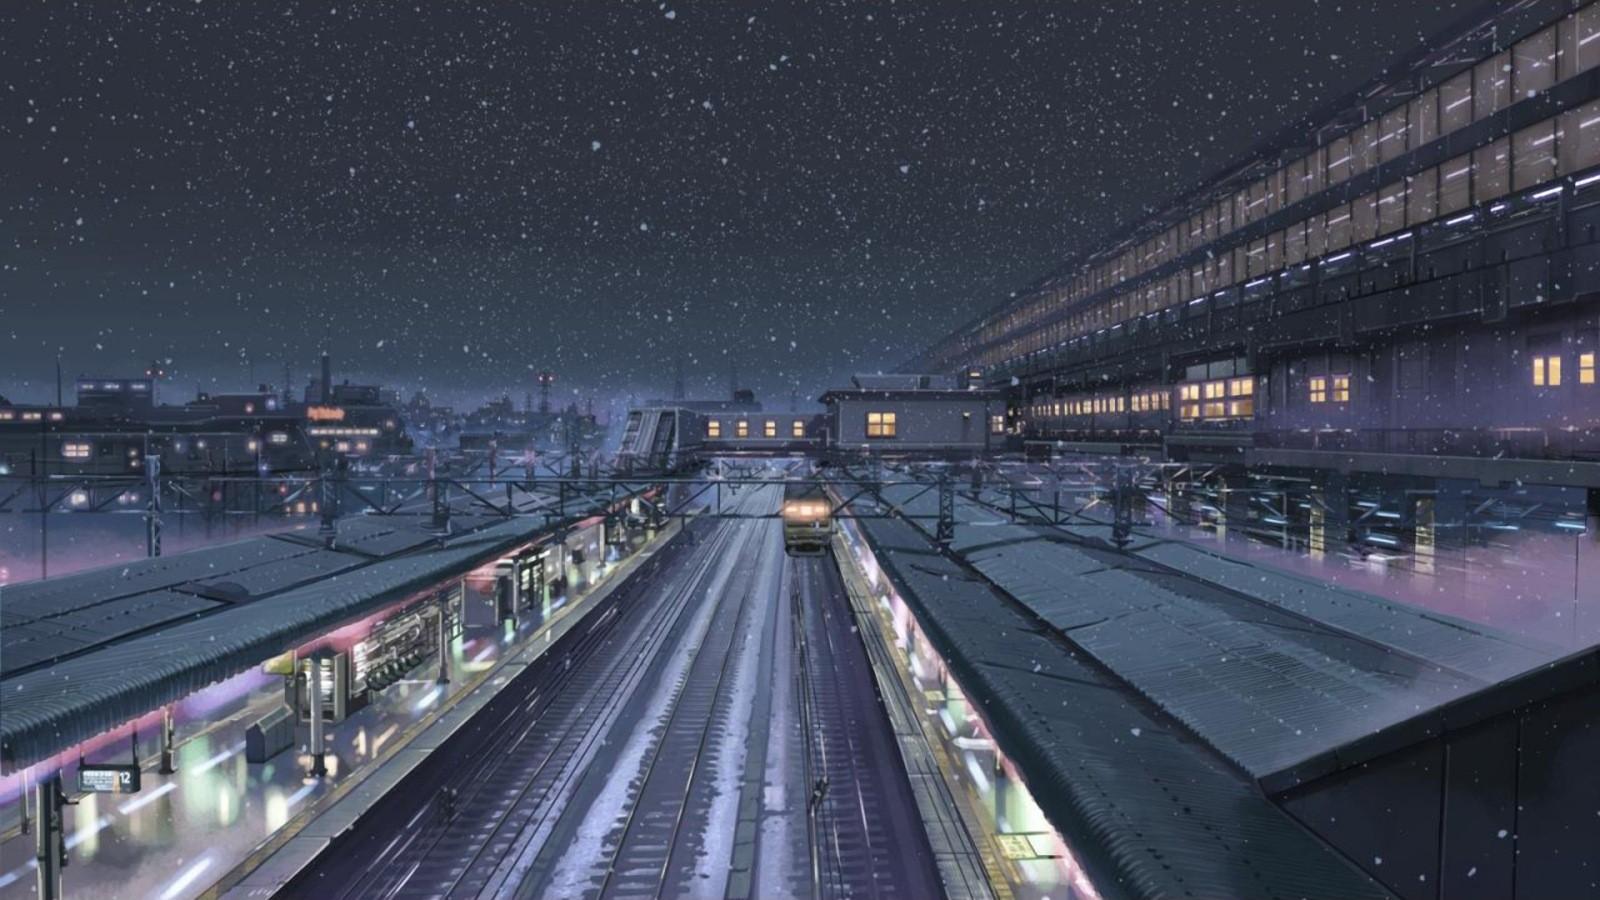 Cityscape Night Snow Winter Train Station Traffic 5 Centimeters Per Second Stadium Makoto Shinkai Transport Screens